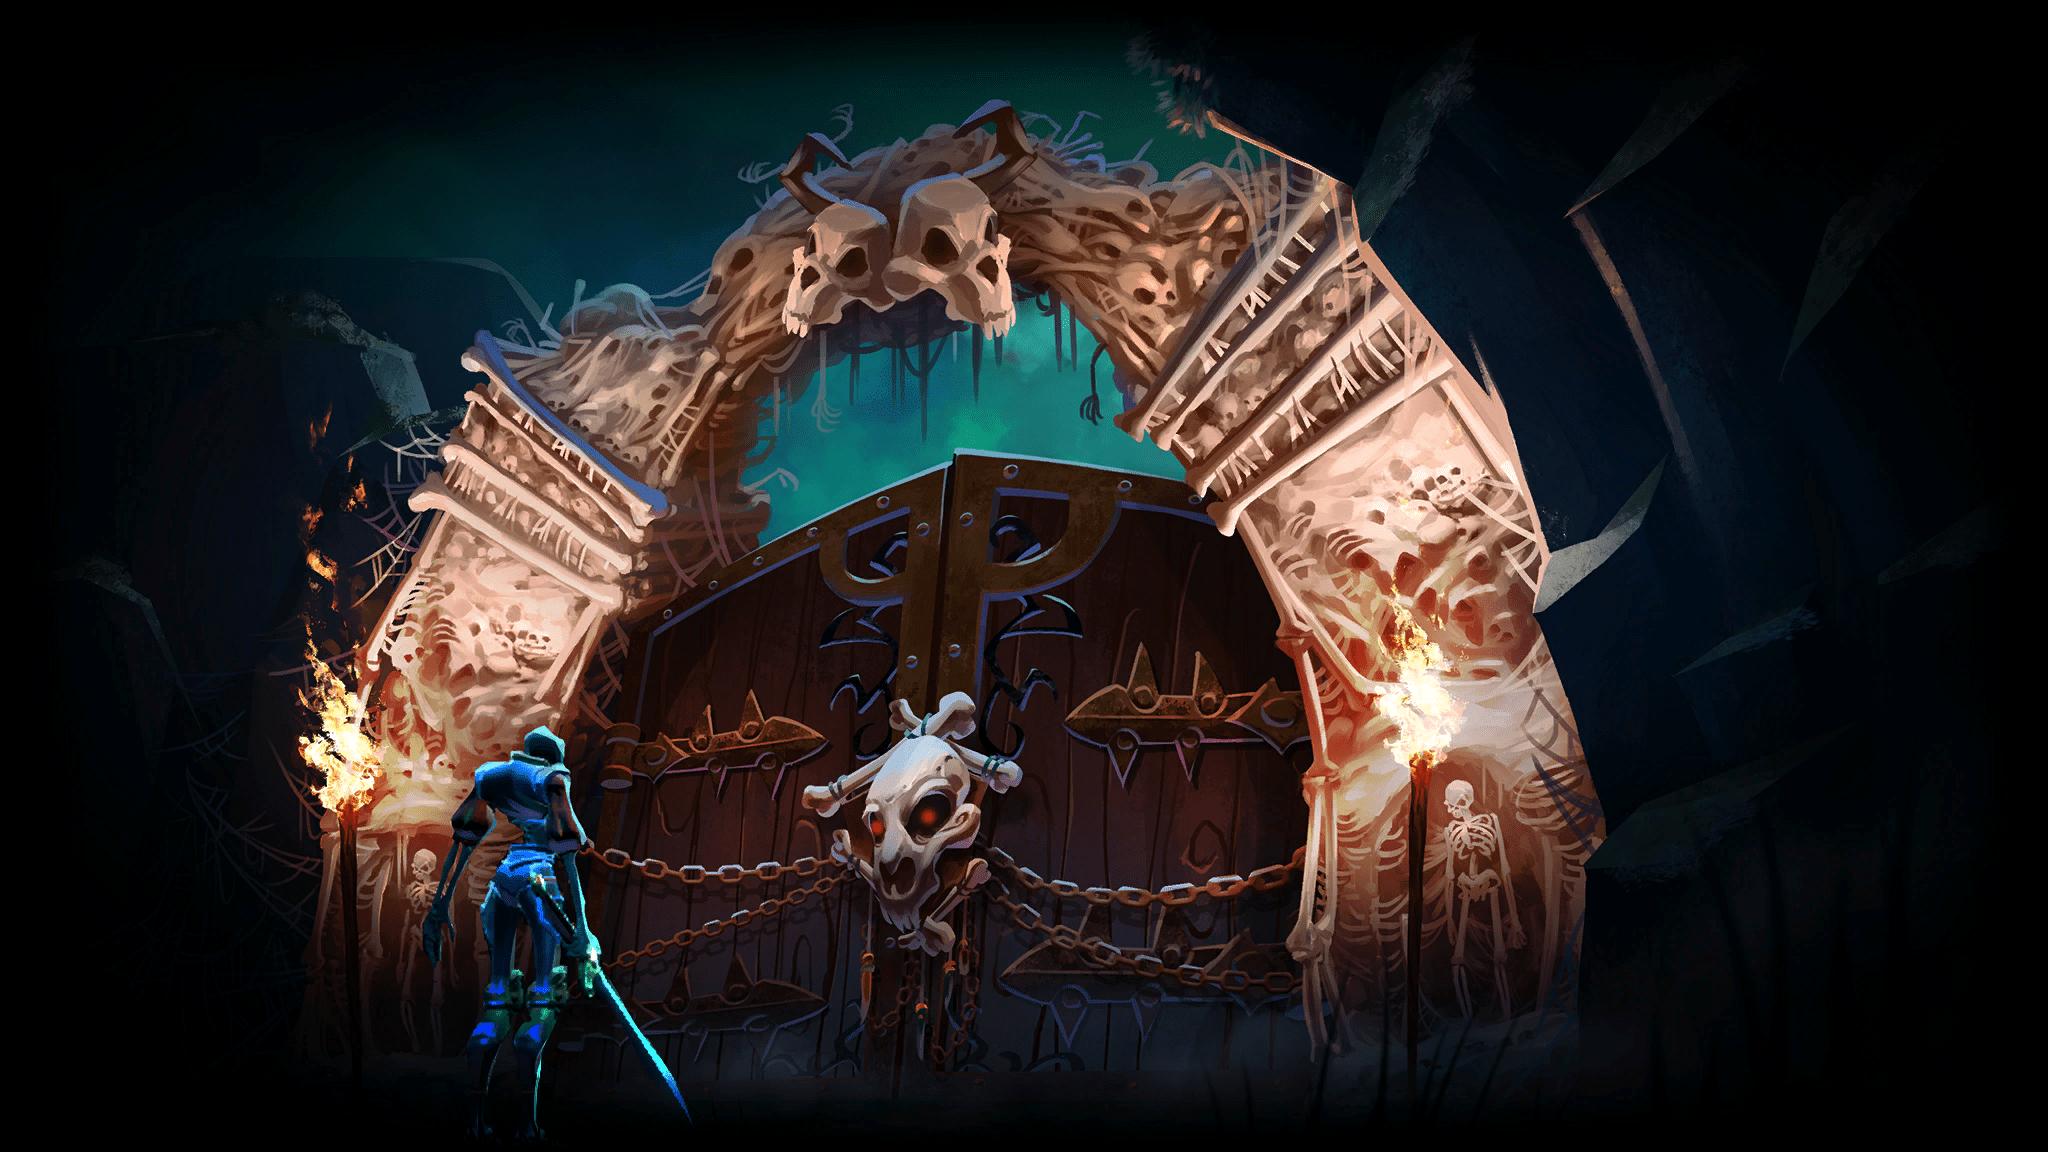 Return to the Graveyard (MediEvil)